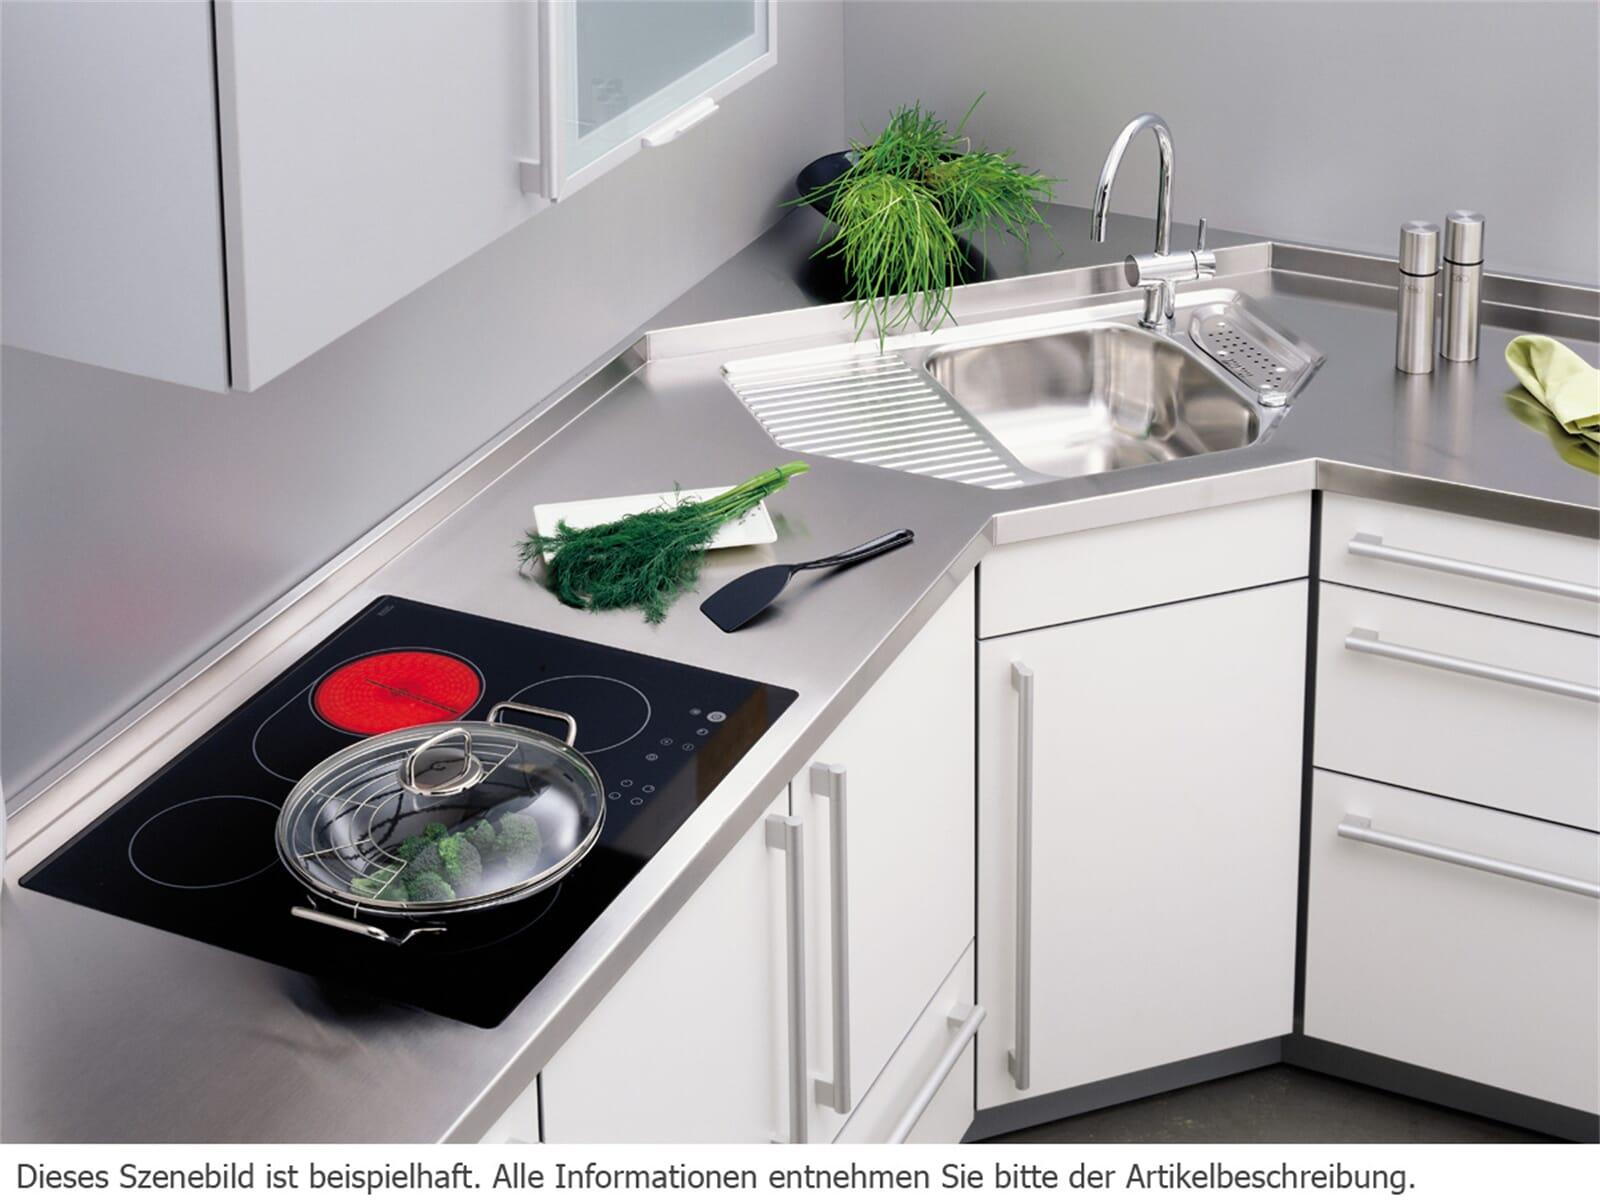 teka tr 642 select glaskeramik kochfeld autark kochstelle herd einbau ebay. Black Bedroom Furniture Sets. Home Design Ideas